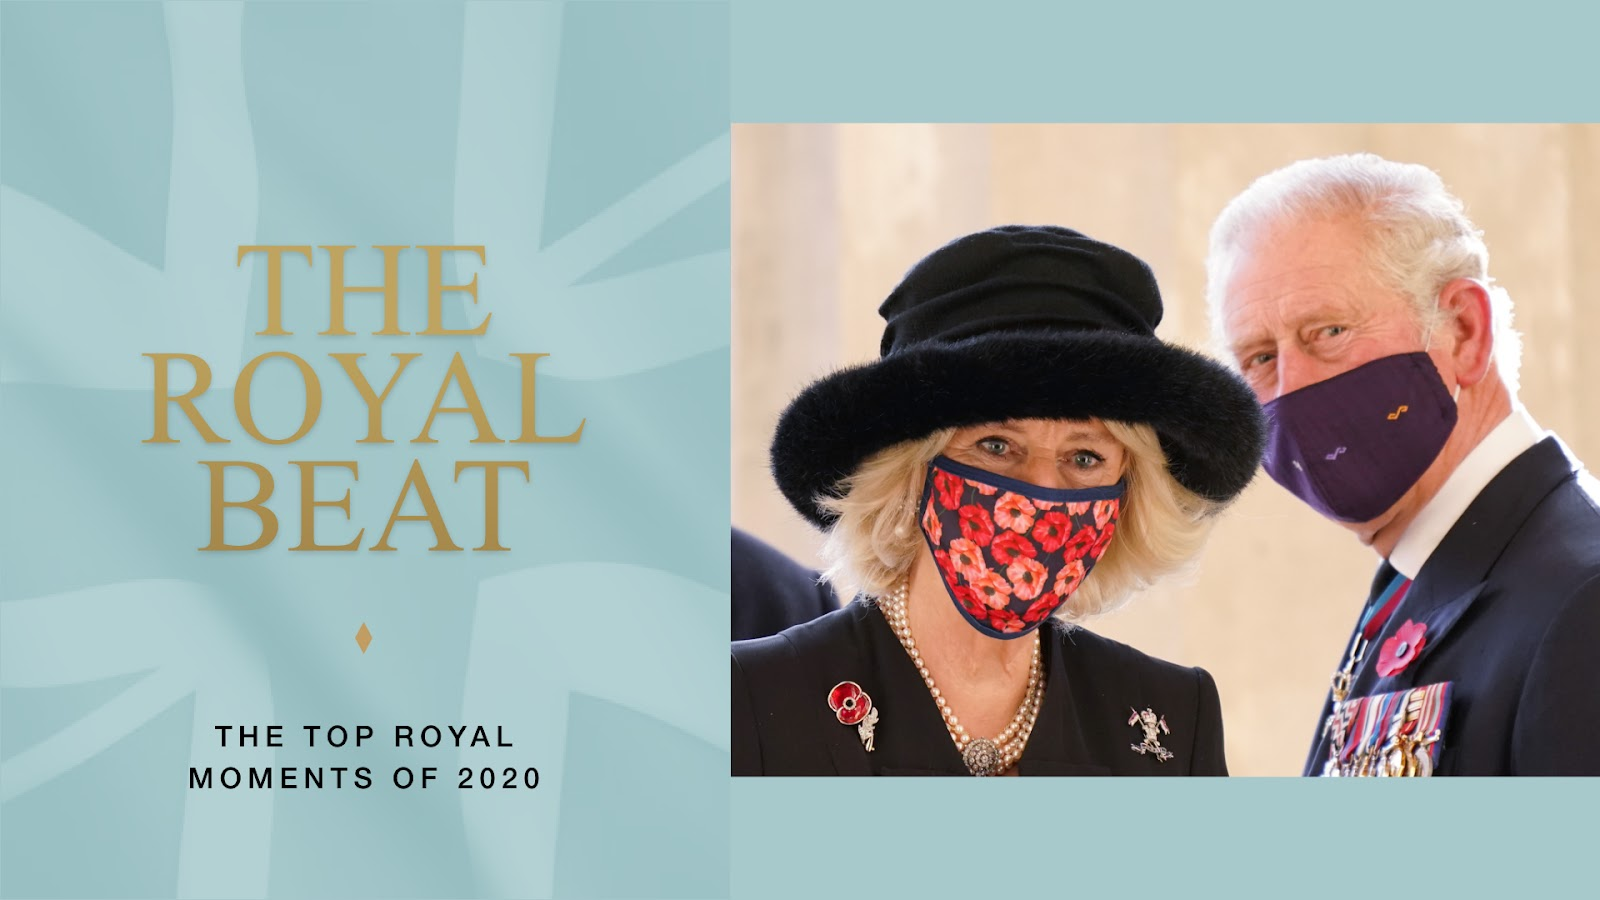 The Royal Beat: The Top Royal Moments of 2020